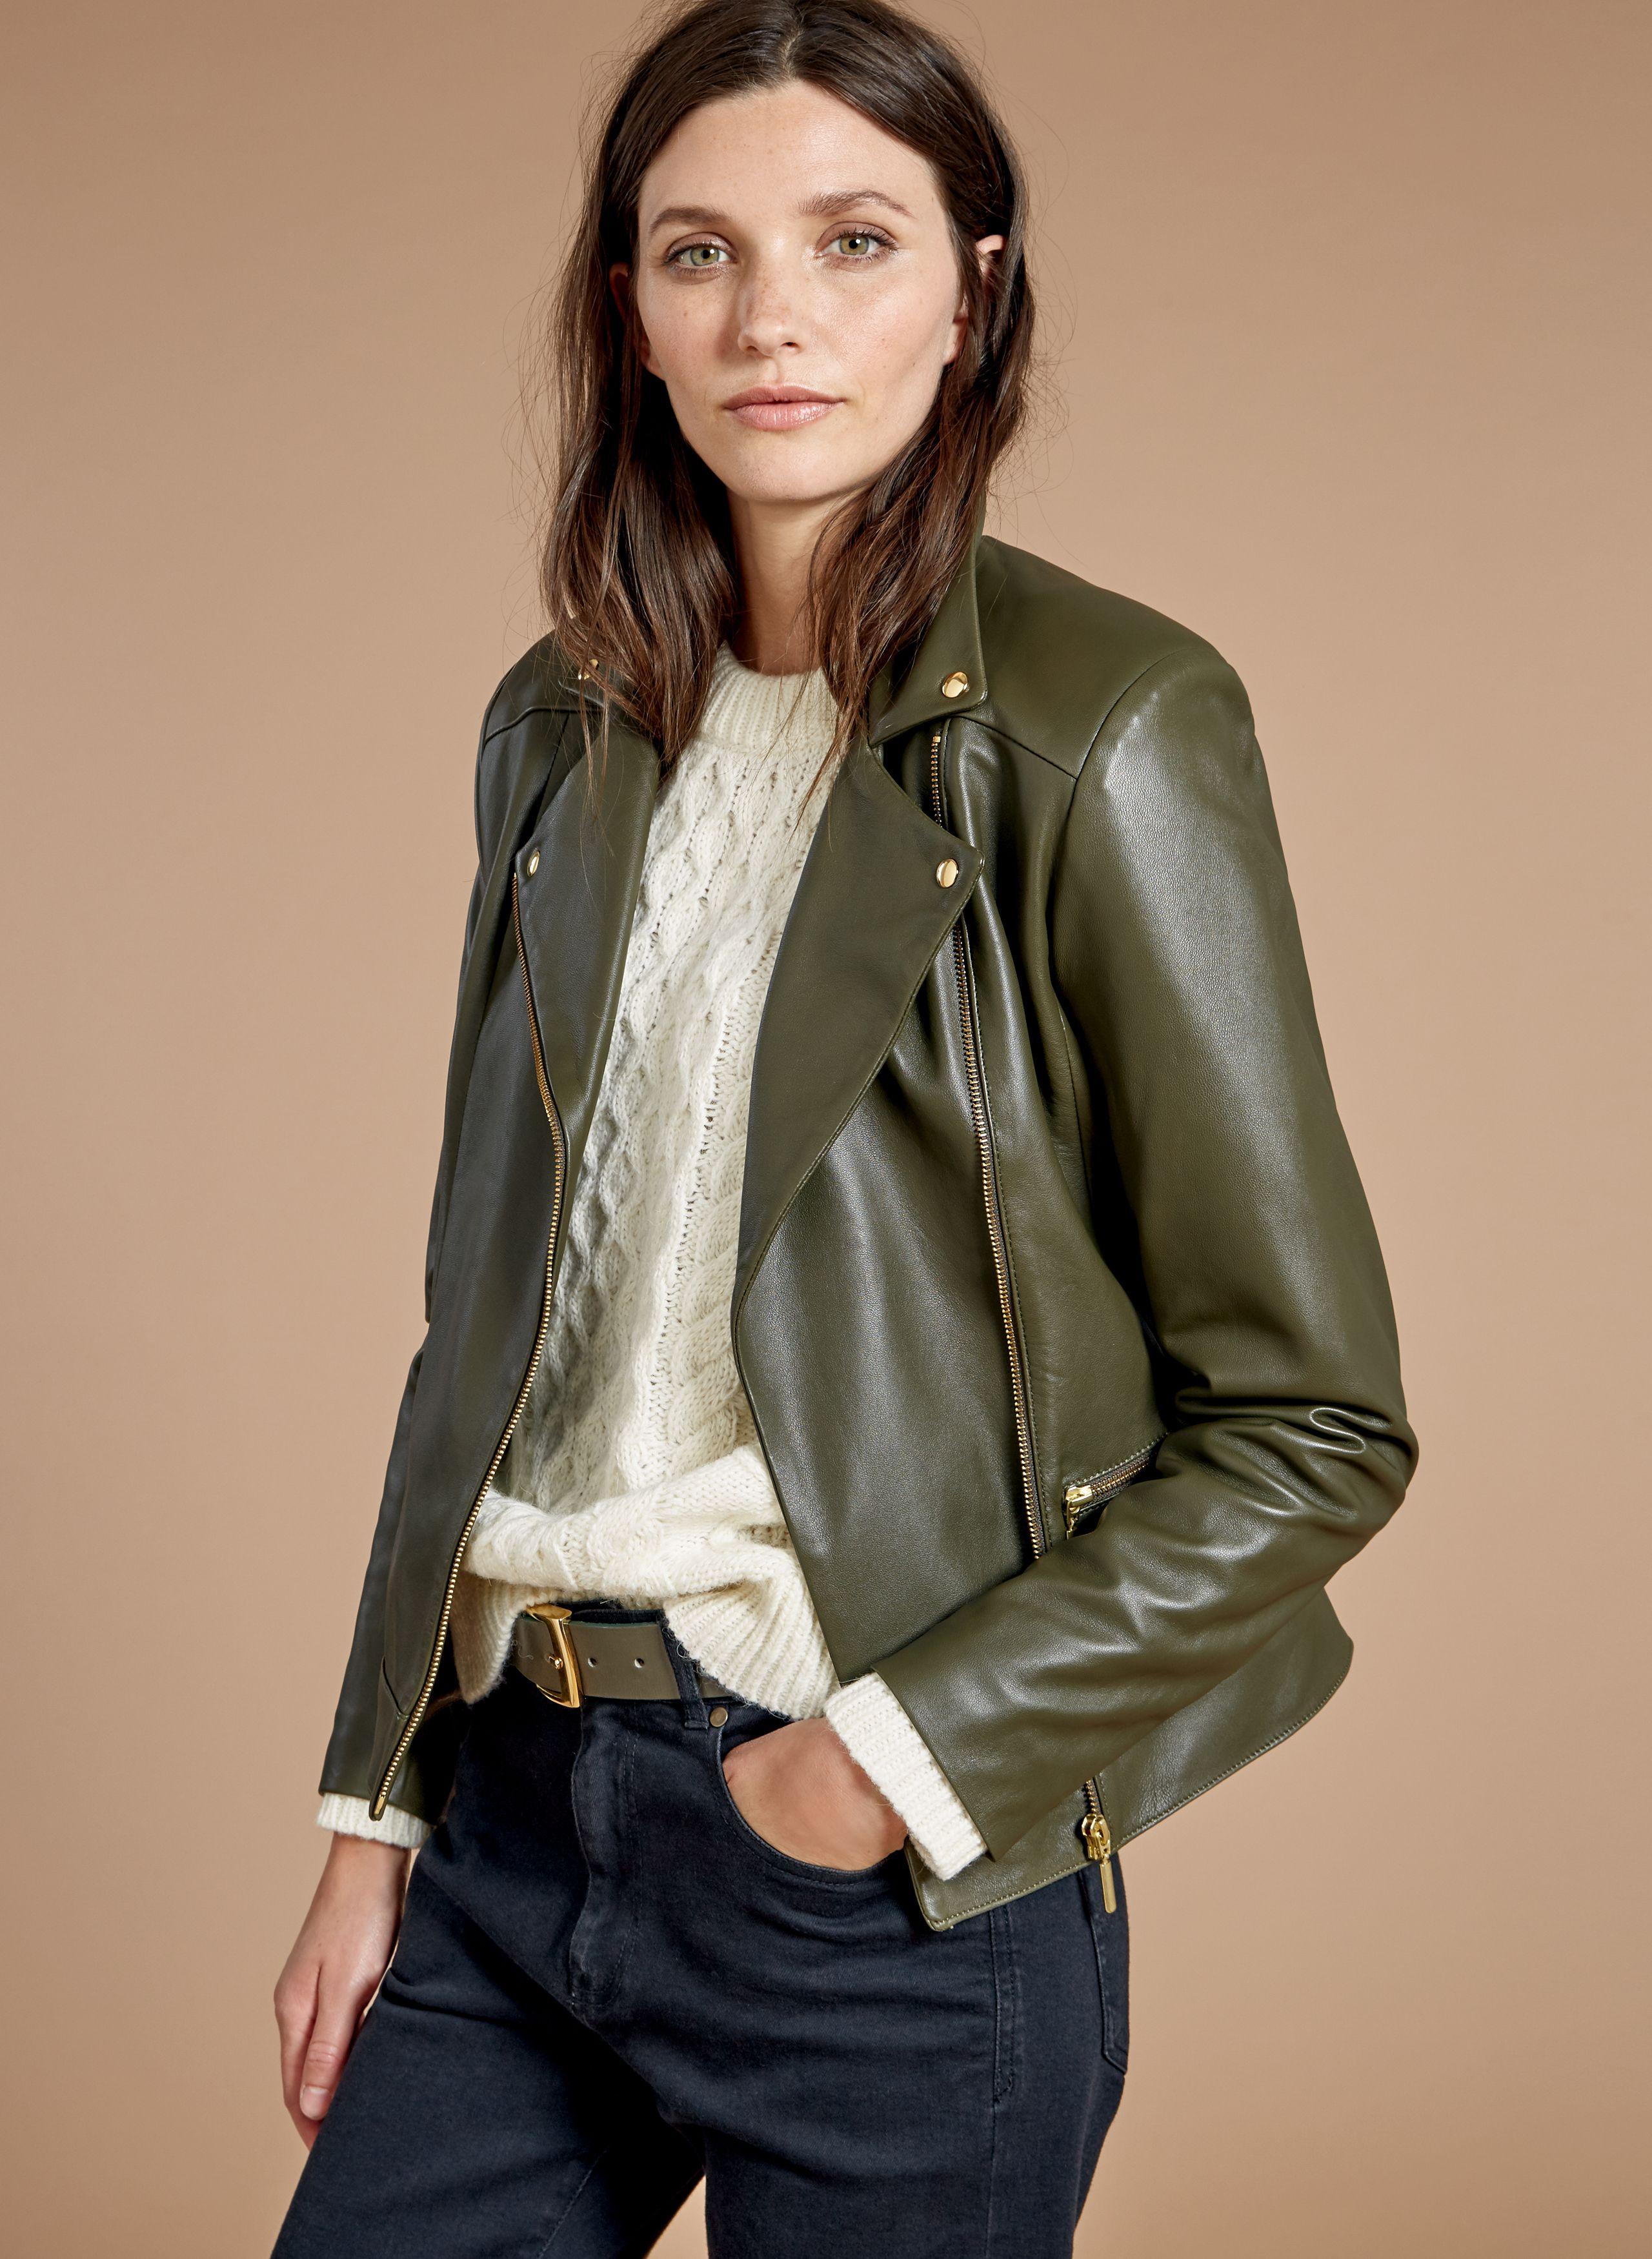 10c0eeaf8 Kara Leather Jacket in 2019   Baukjen AW18 Collection   Jackets ...